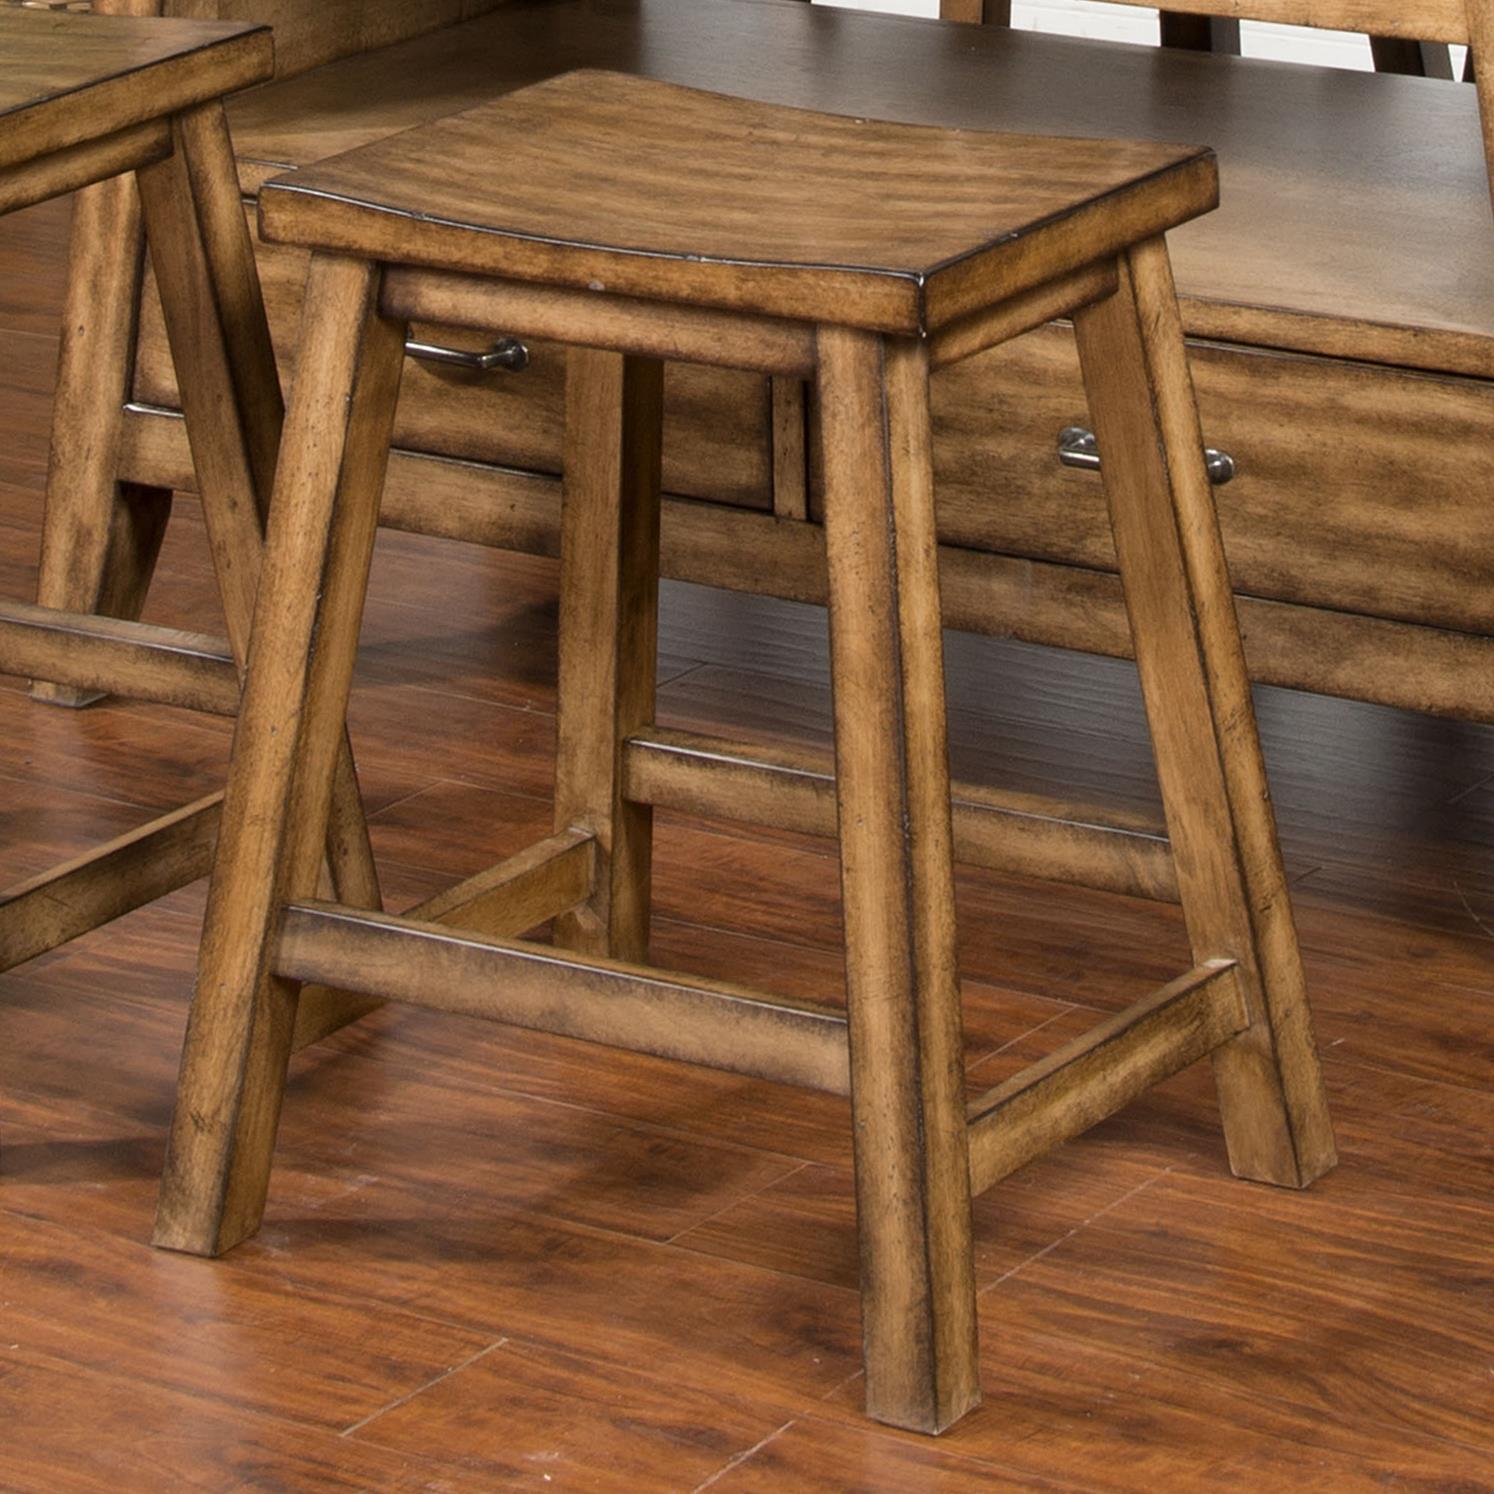 Sunny Designs Cornerstone Barstool, Wood Seat - Item Number: 1526BM-24